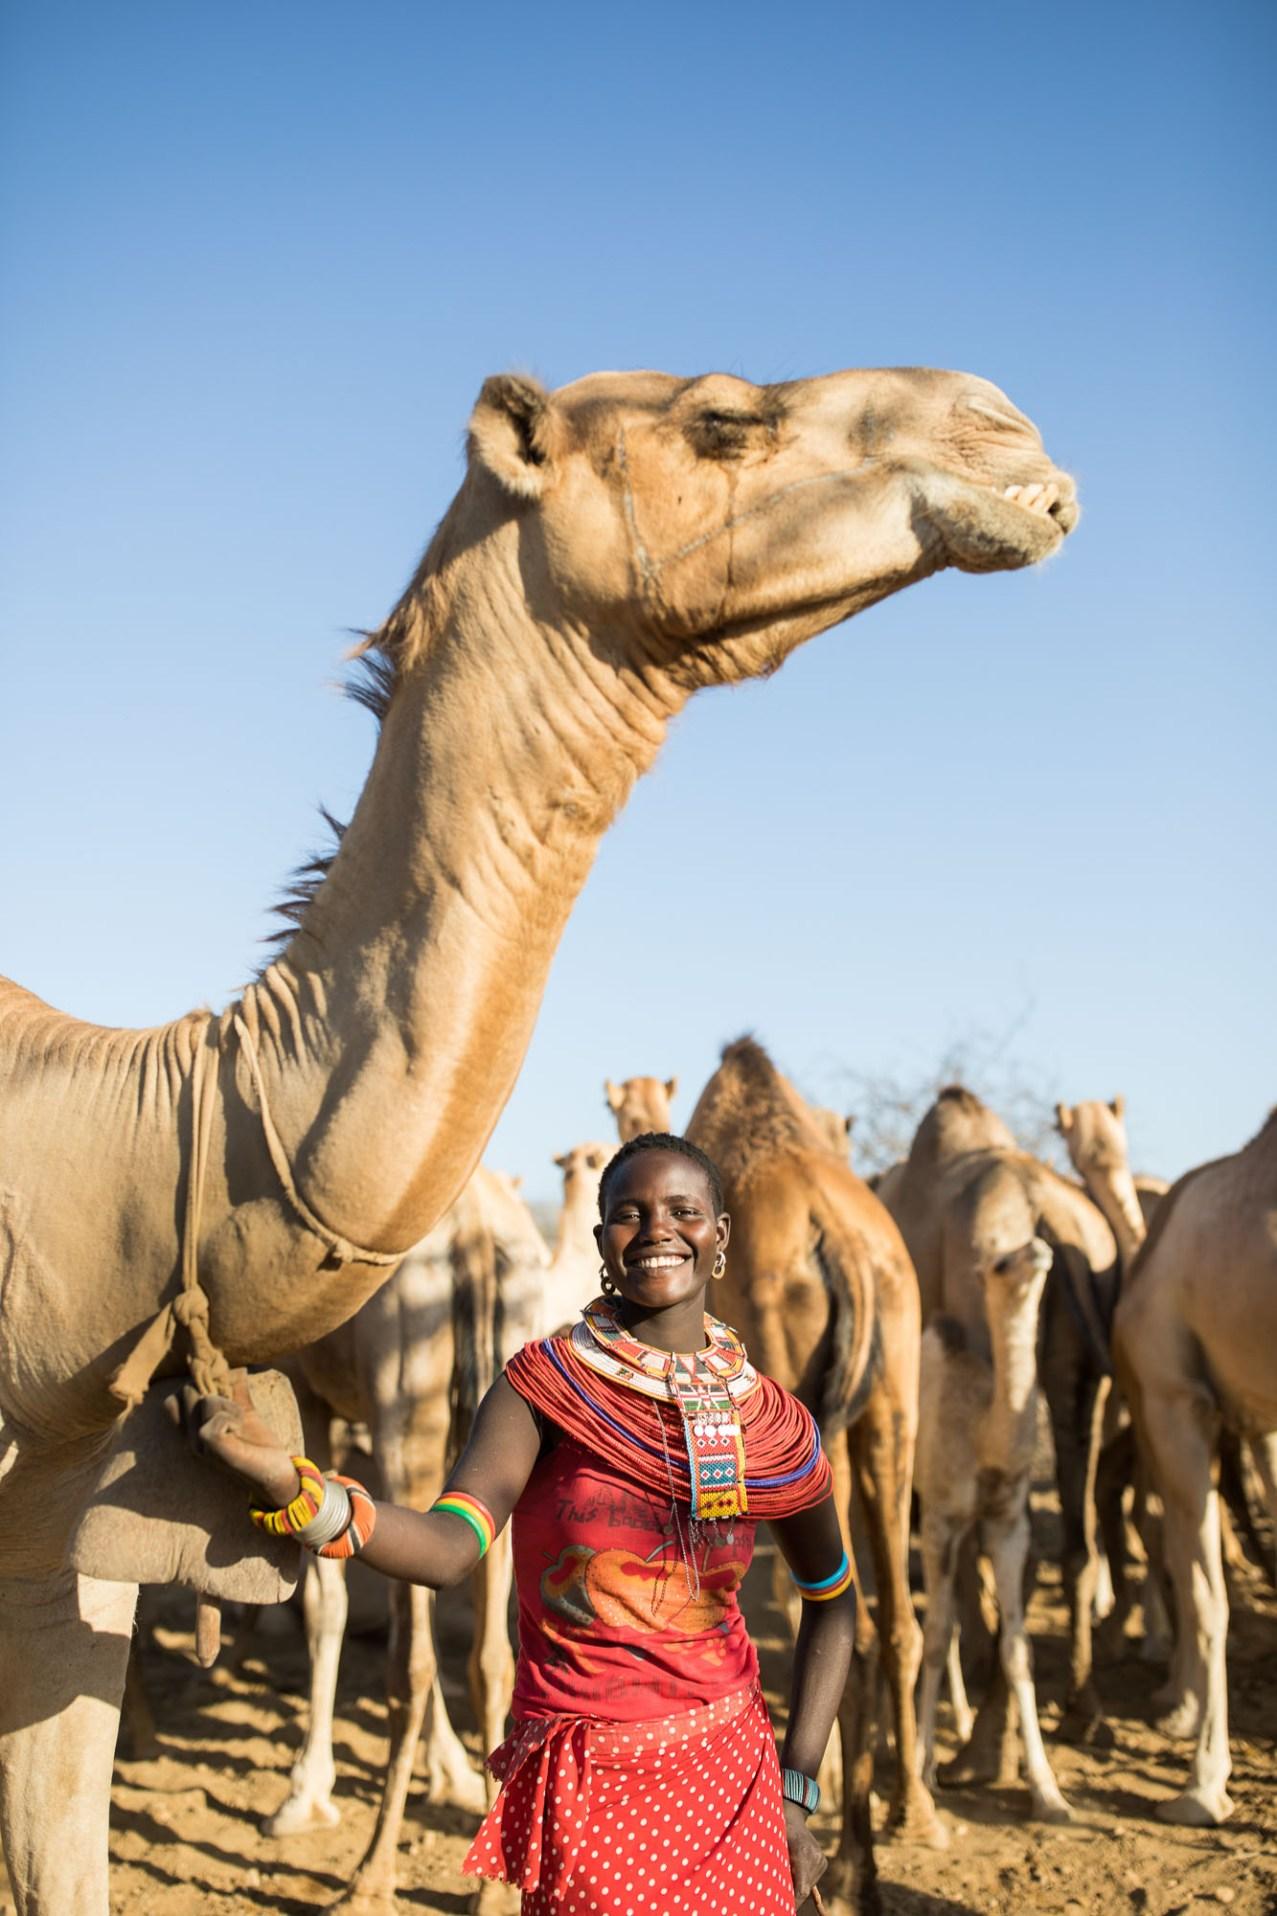 A young woman herds camels in Samburu County, Kenya.